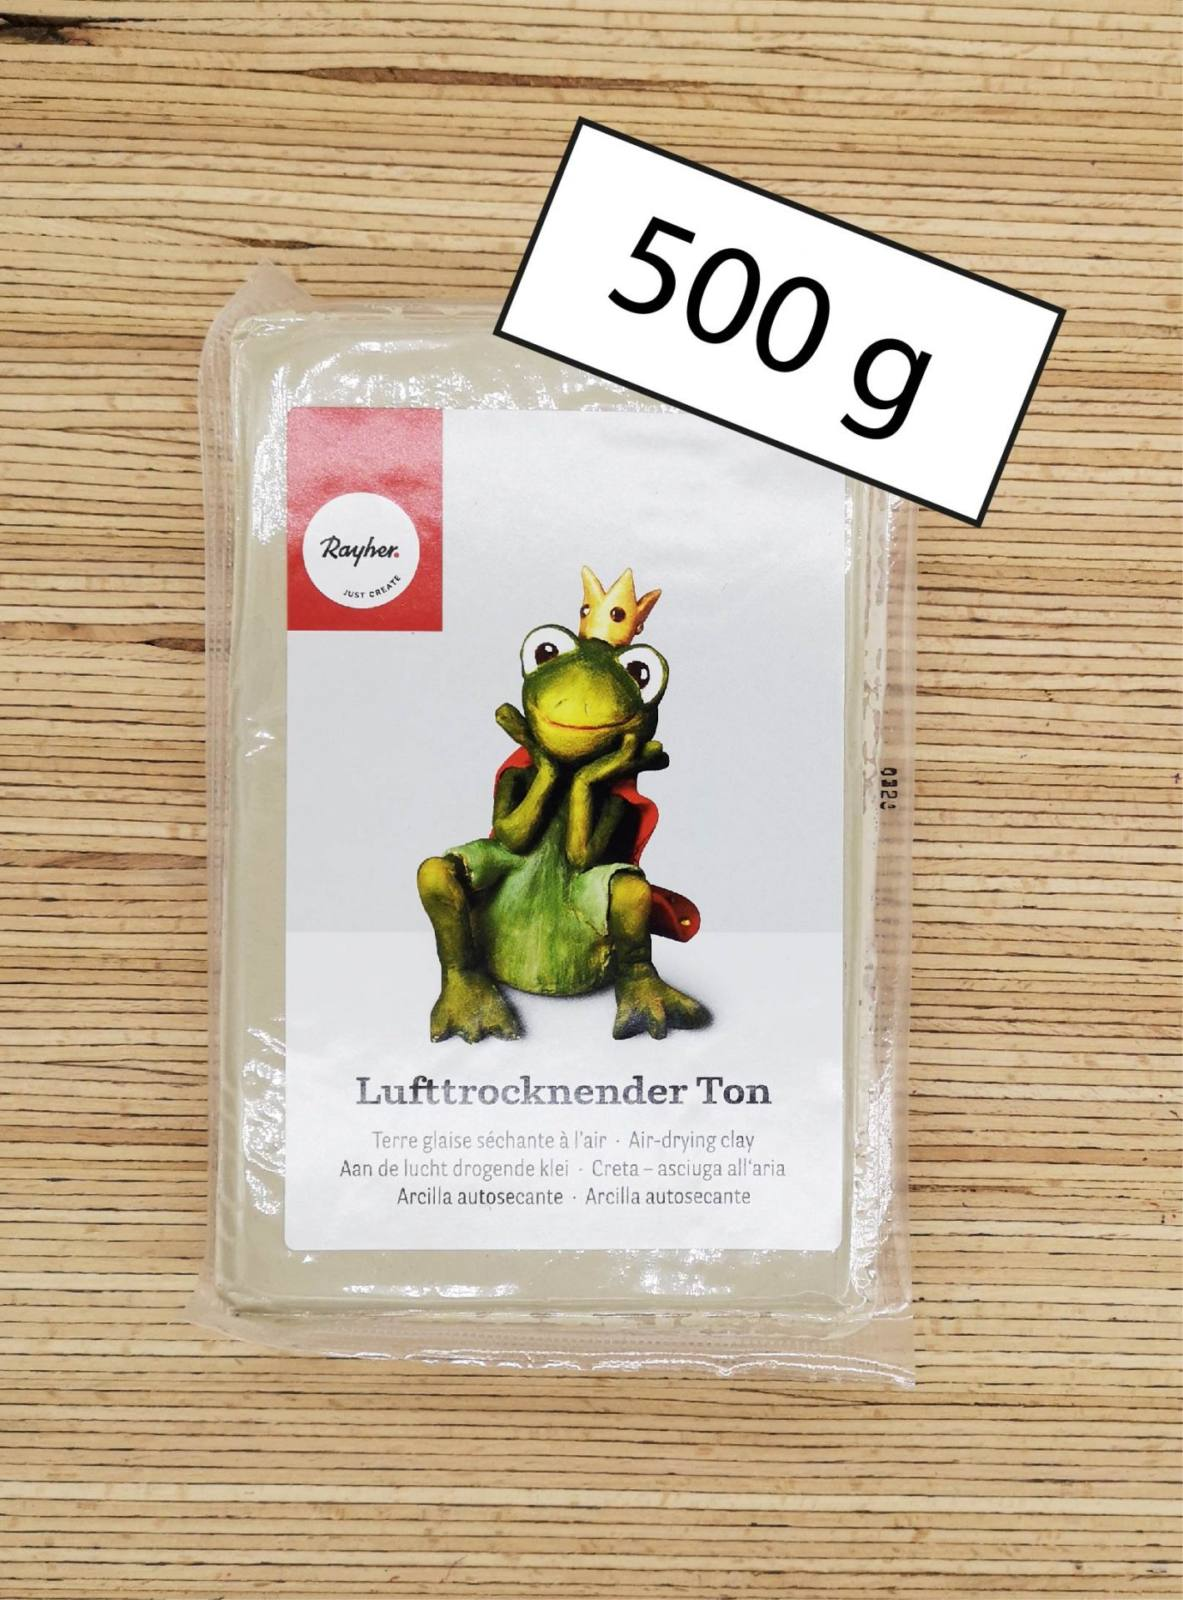 500 g lufttrocknender Ton-01